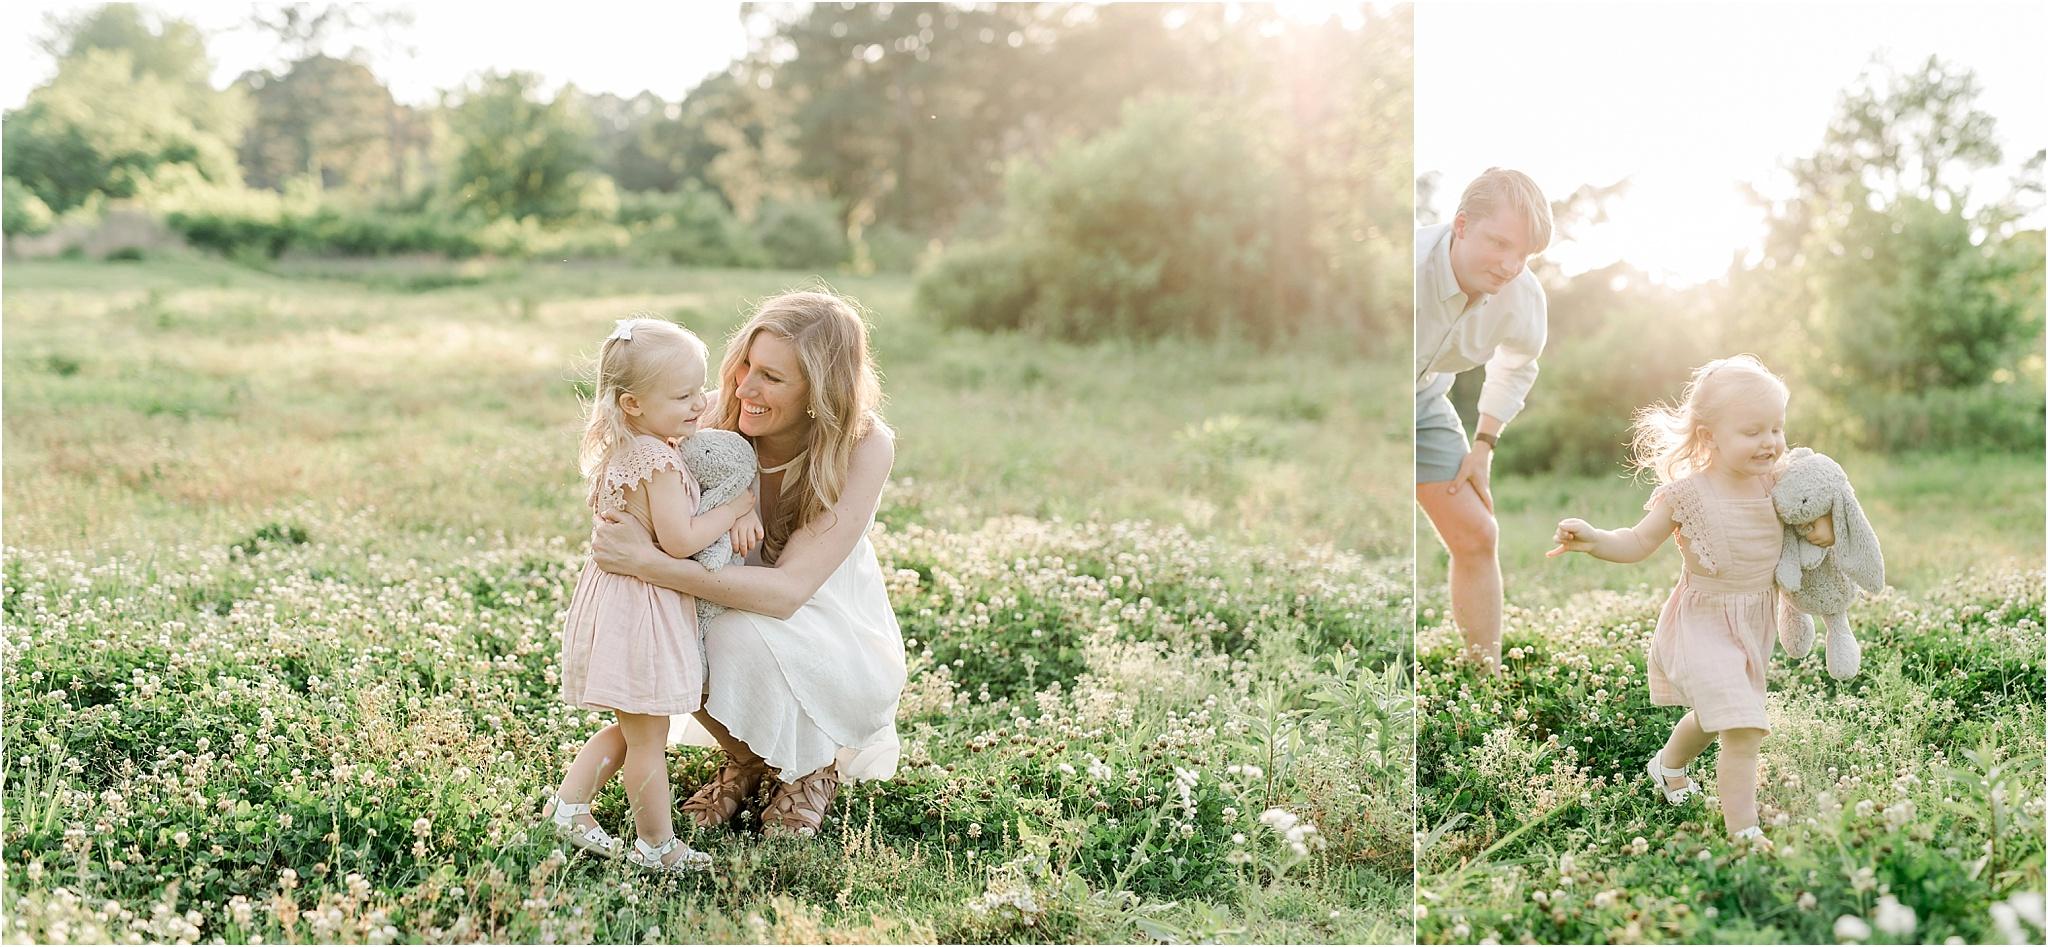 Rachel_Bond_Birmingham_AL-family-photography_0013.jpg